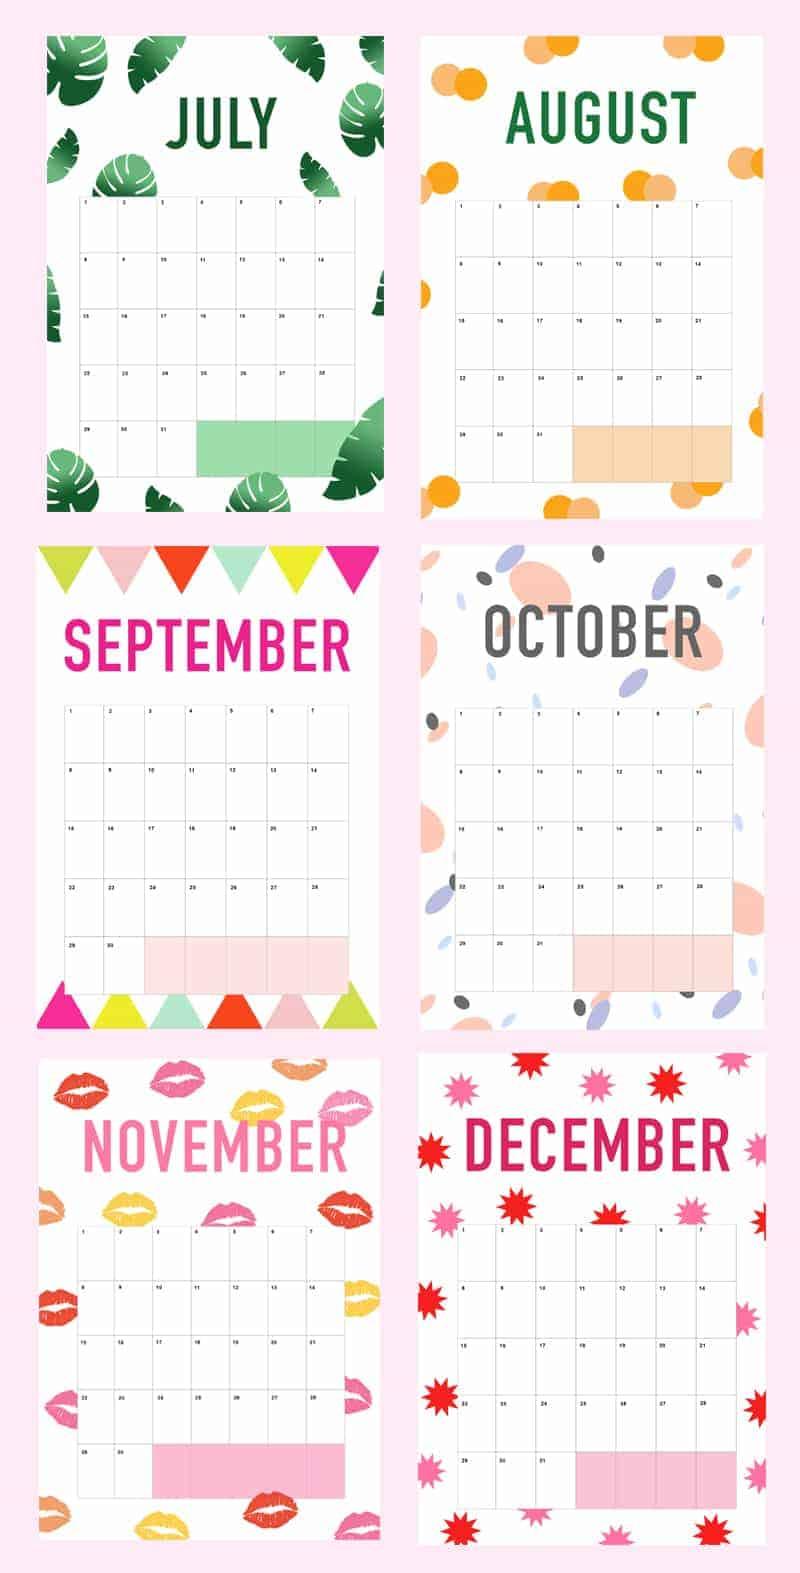 Printable DIY Wedding Planner Organiser Calendar 2